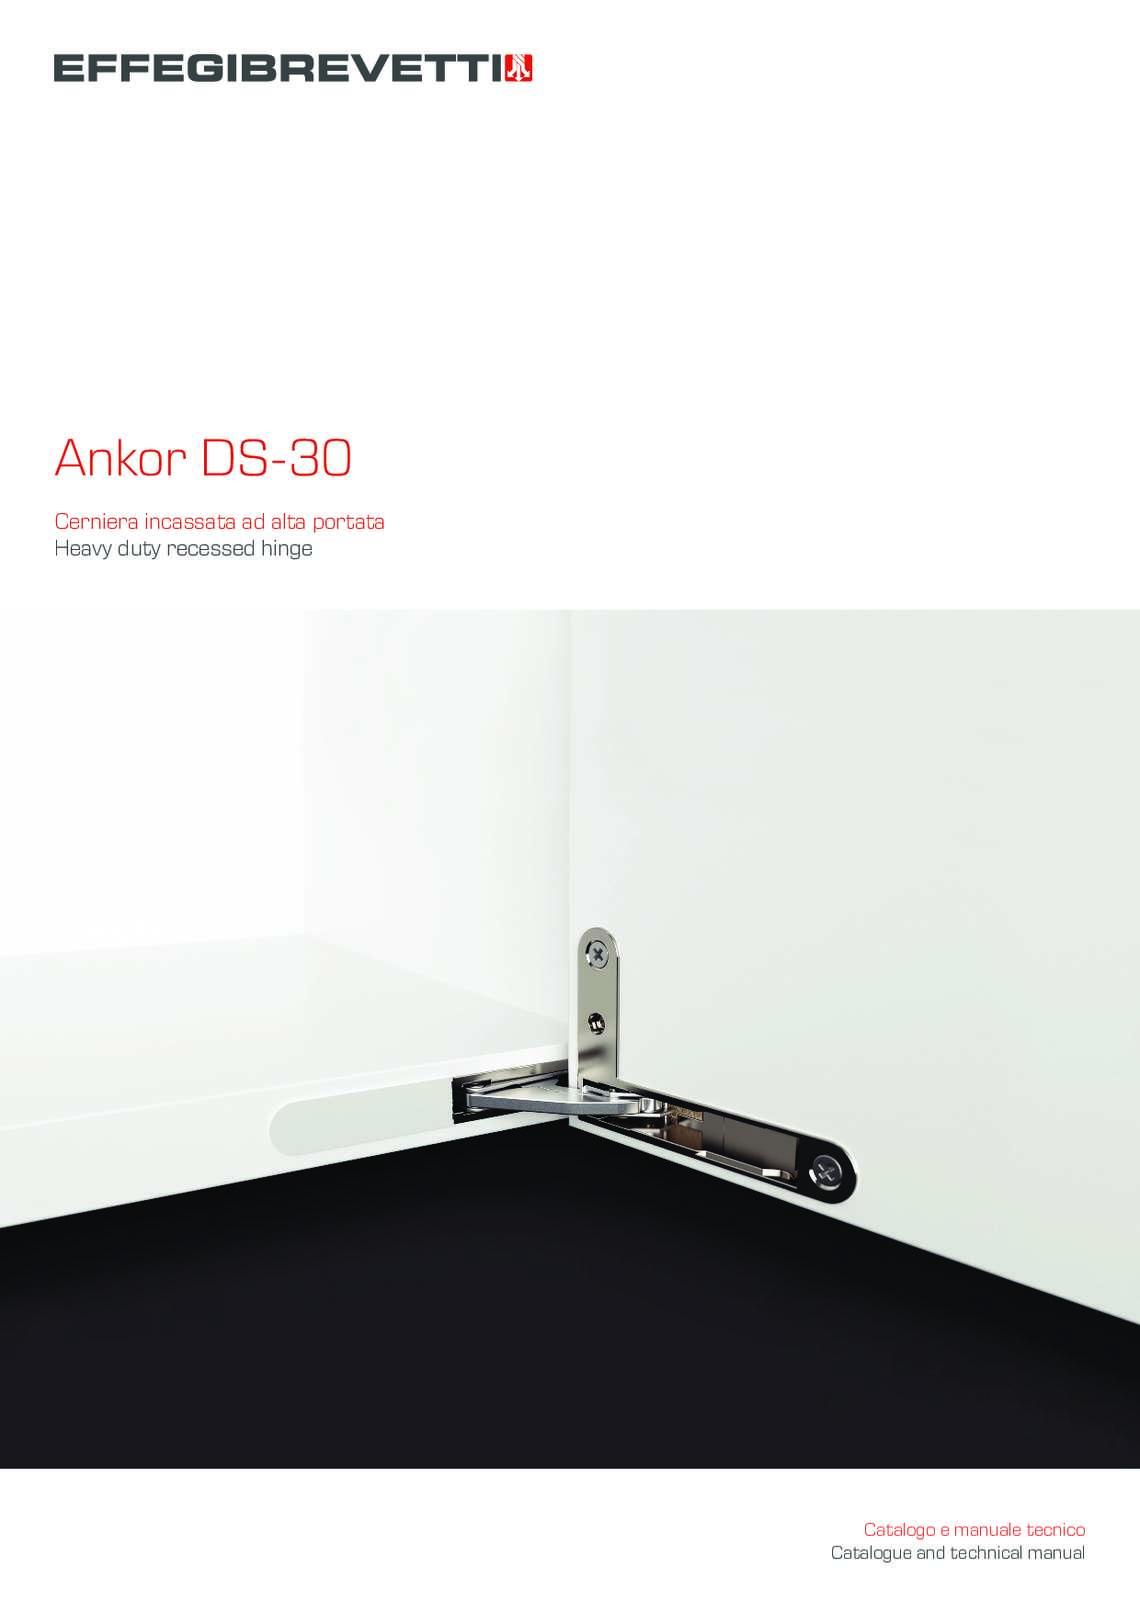 Ankor DS-30 - Cerniera incassata ad alta portata